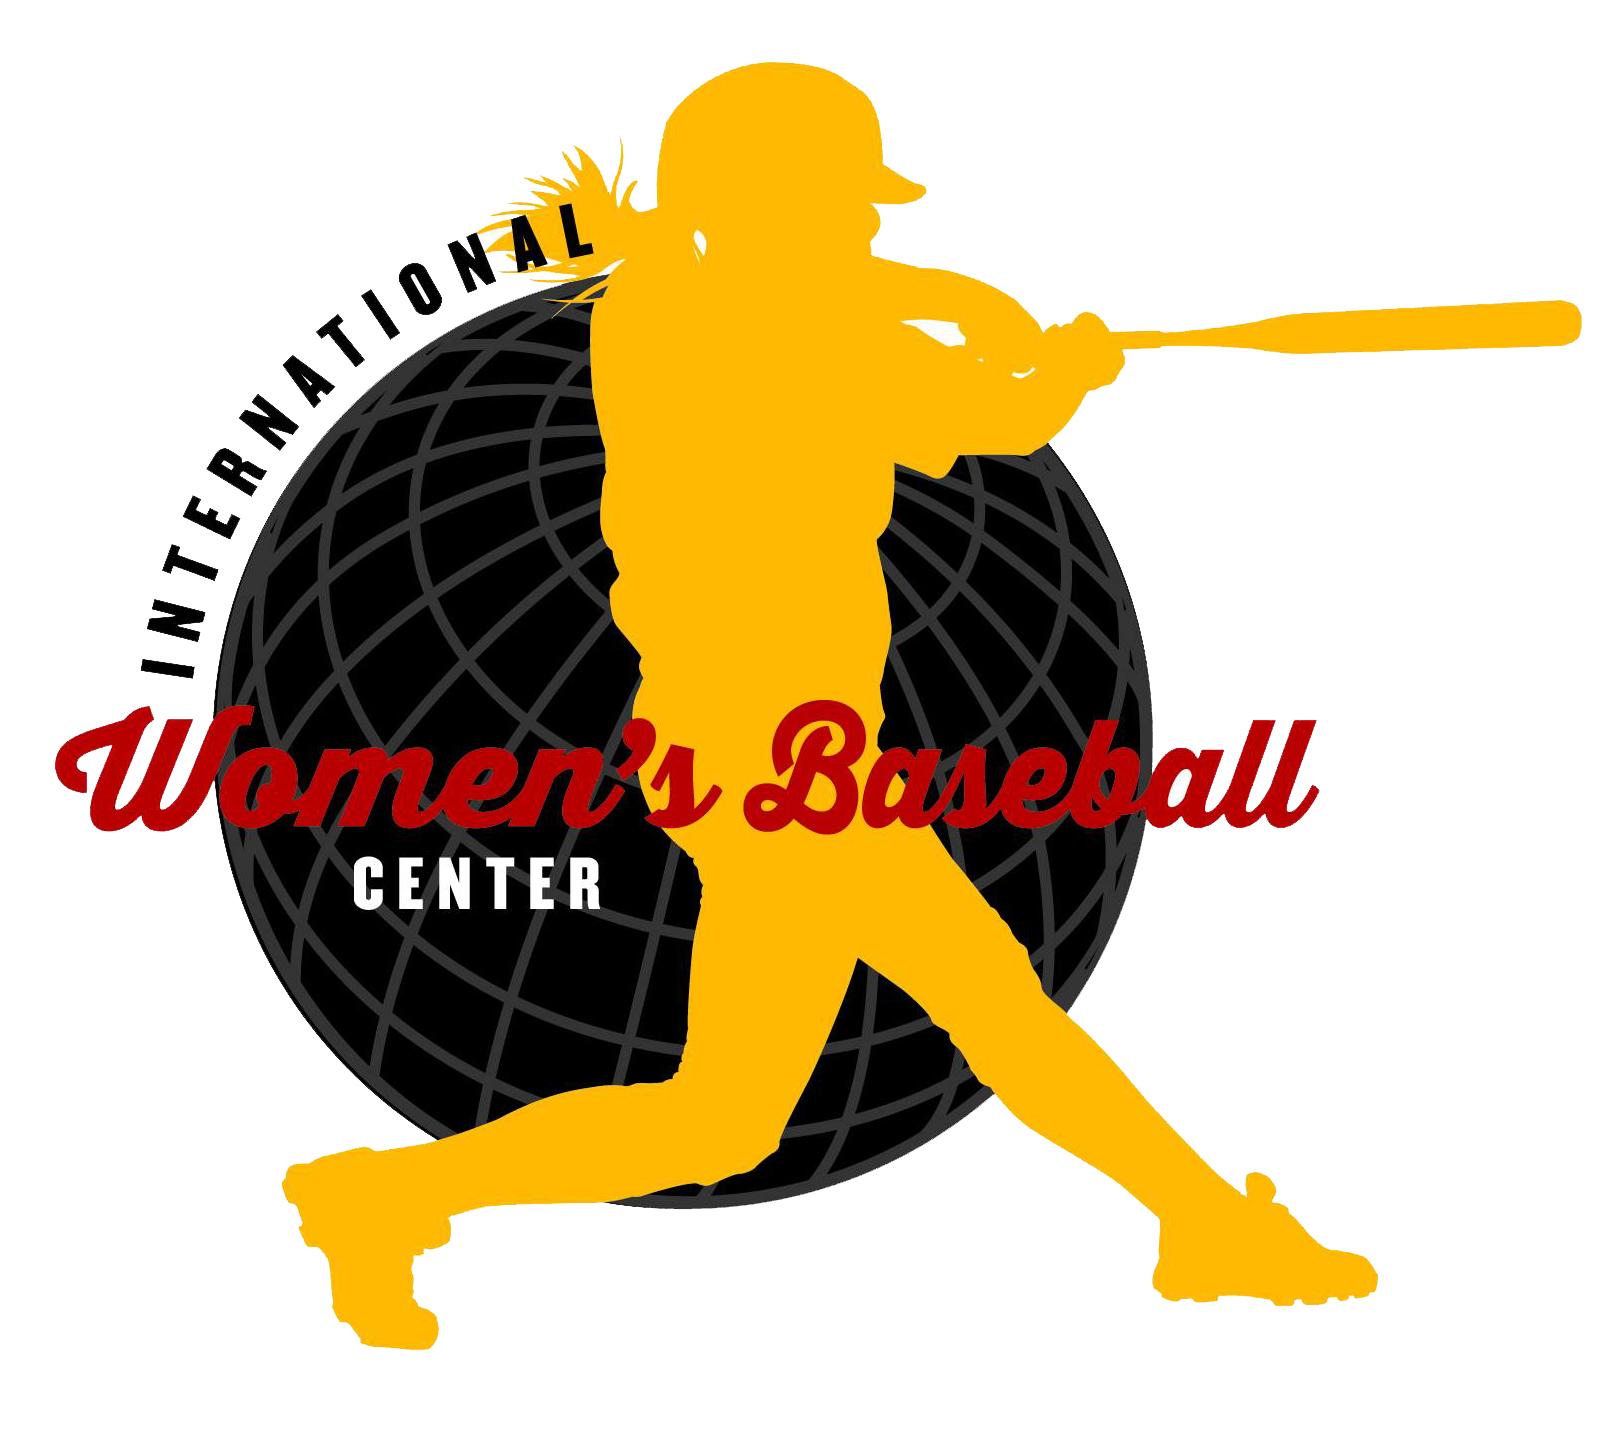 International Women's Baseball Center